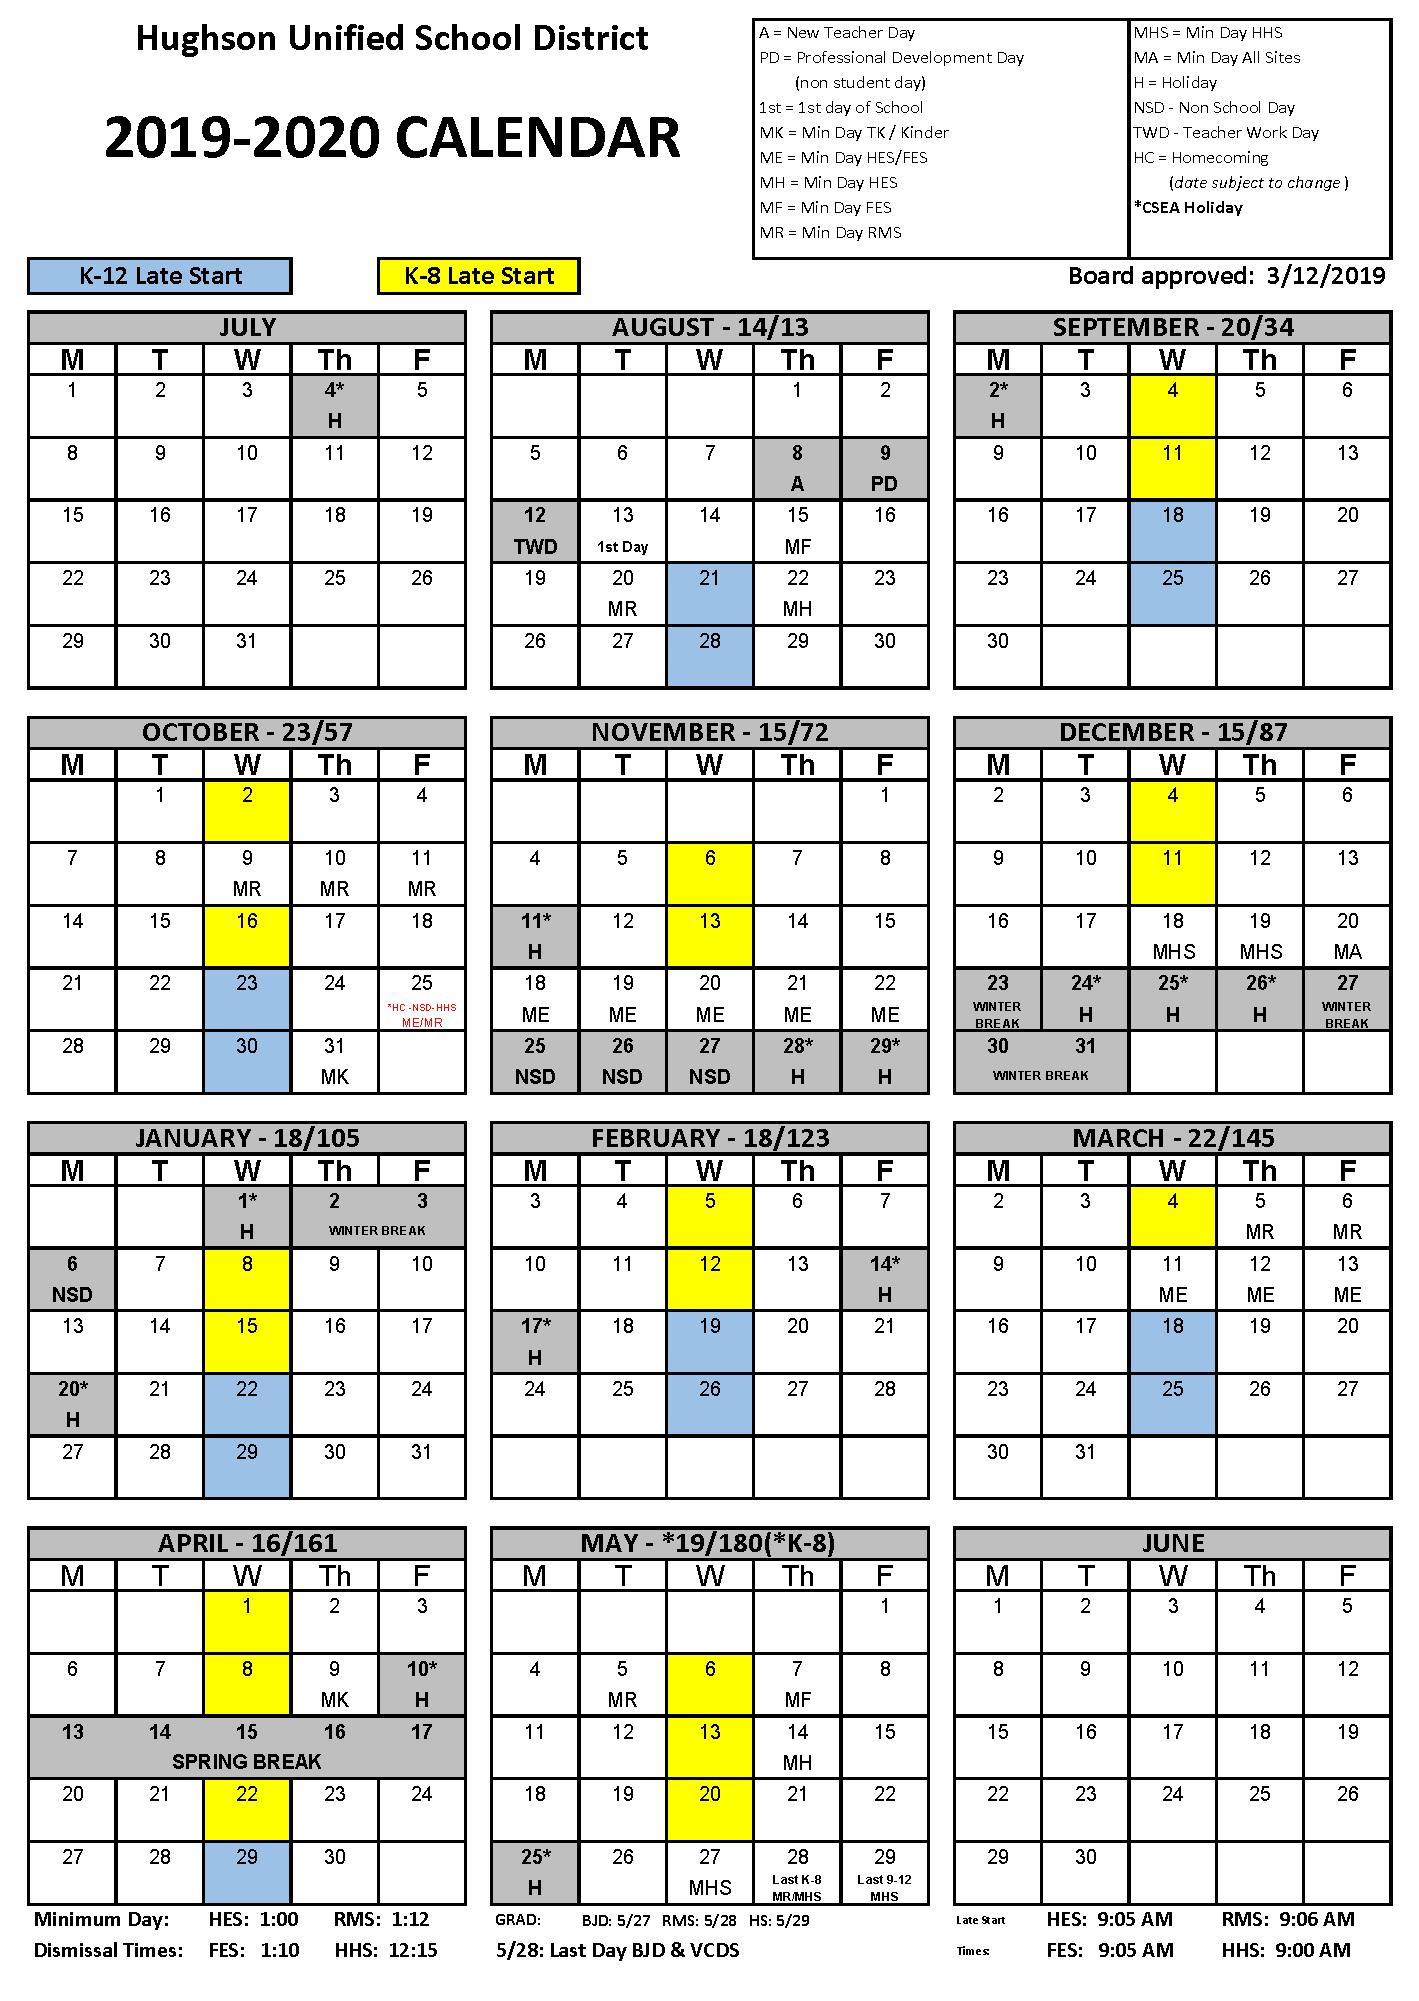 Calendar - Hughson Unified School District throughout Lodi Unified School District Calendar